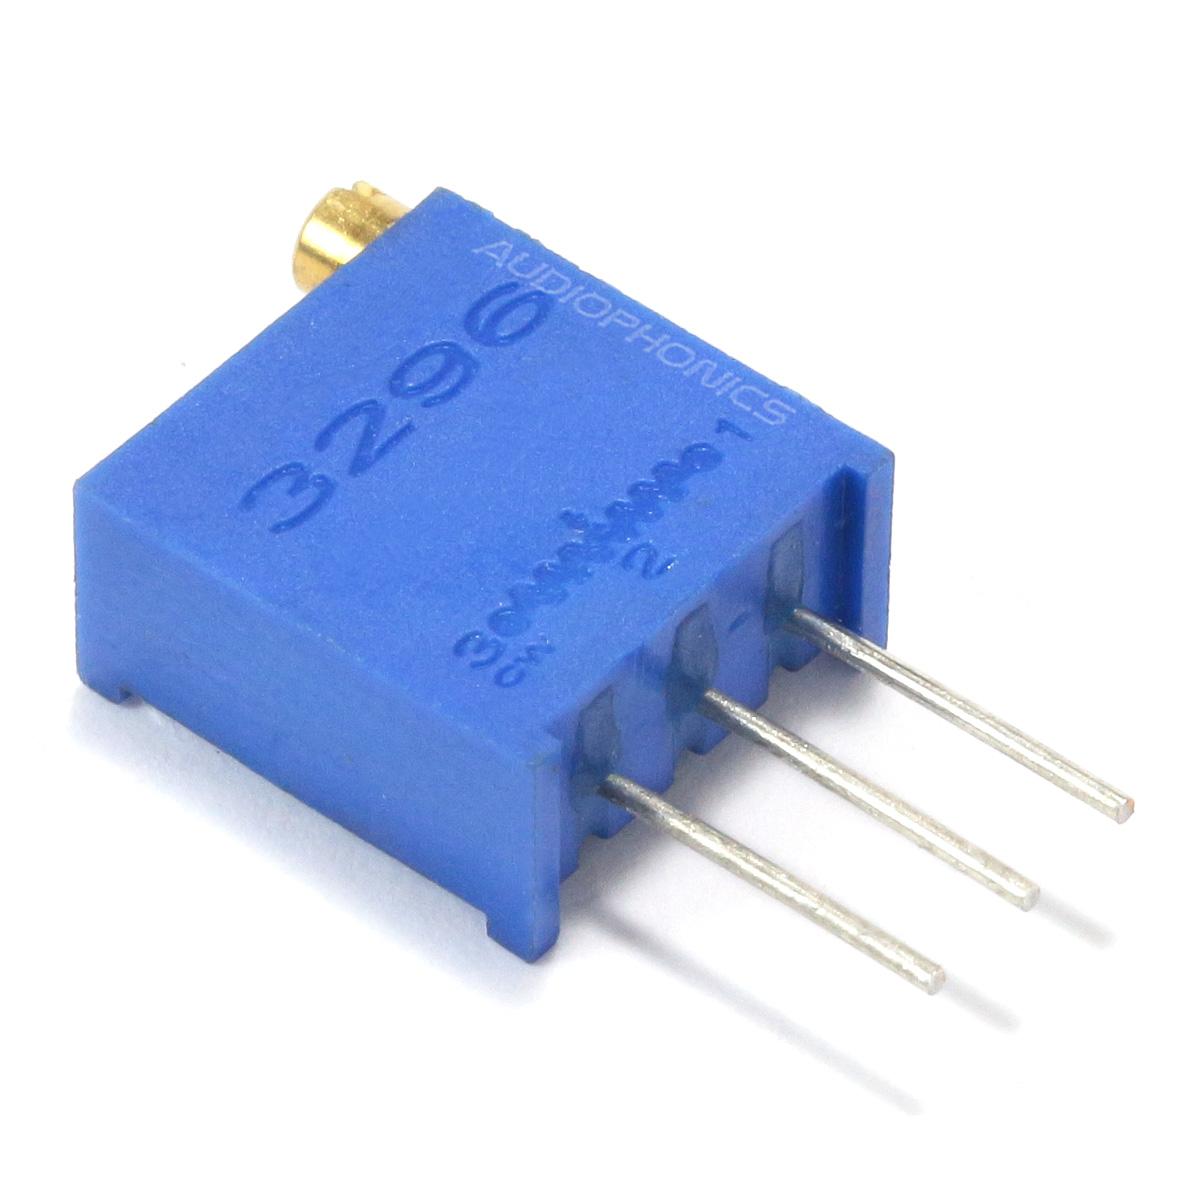 3296W-1-103 Multiturn Trimming Potentiometer 10K Ohm